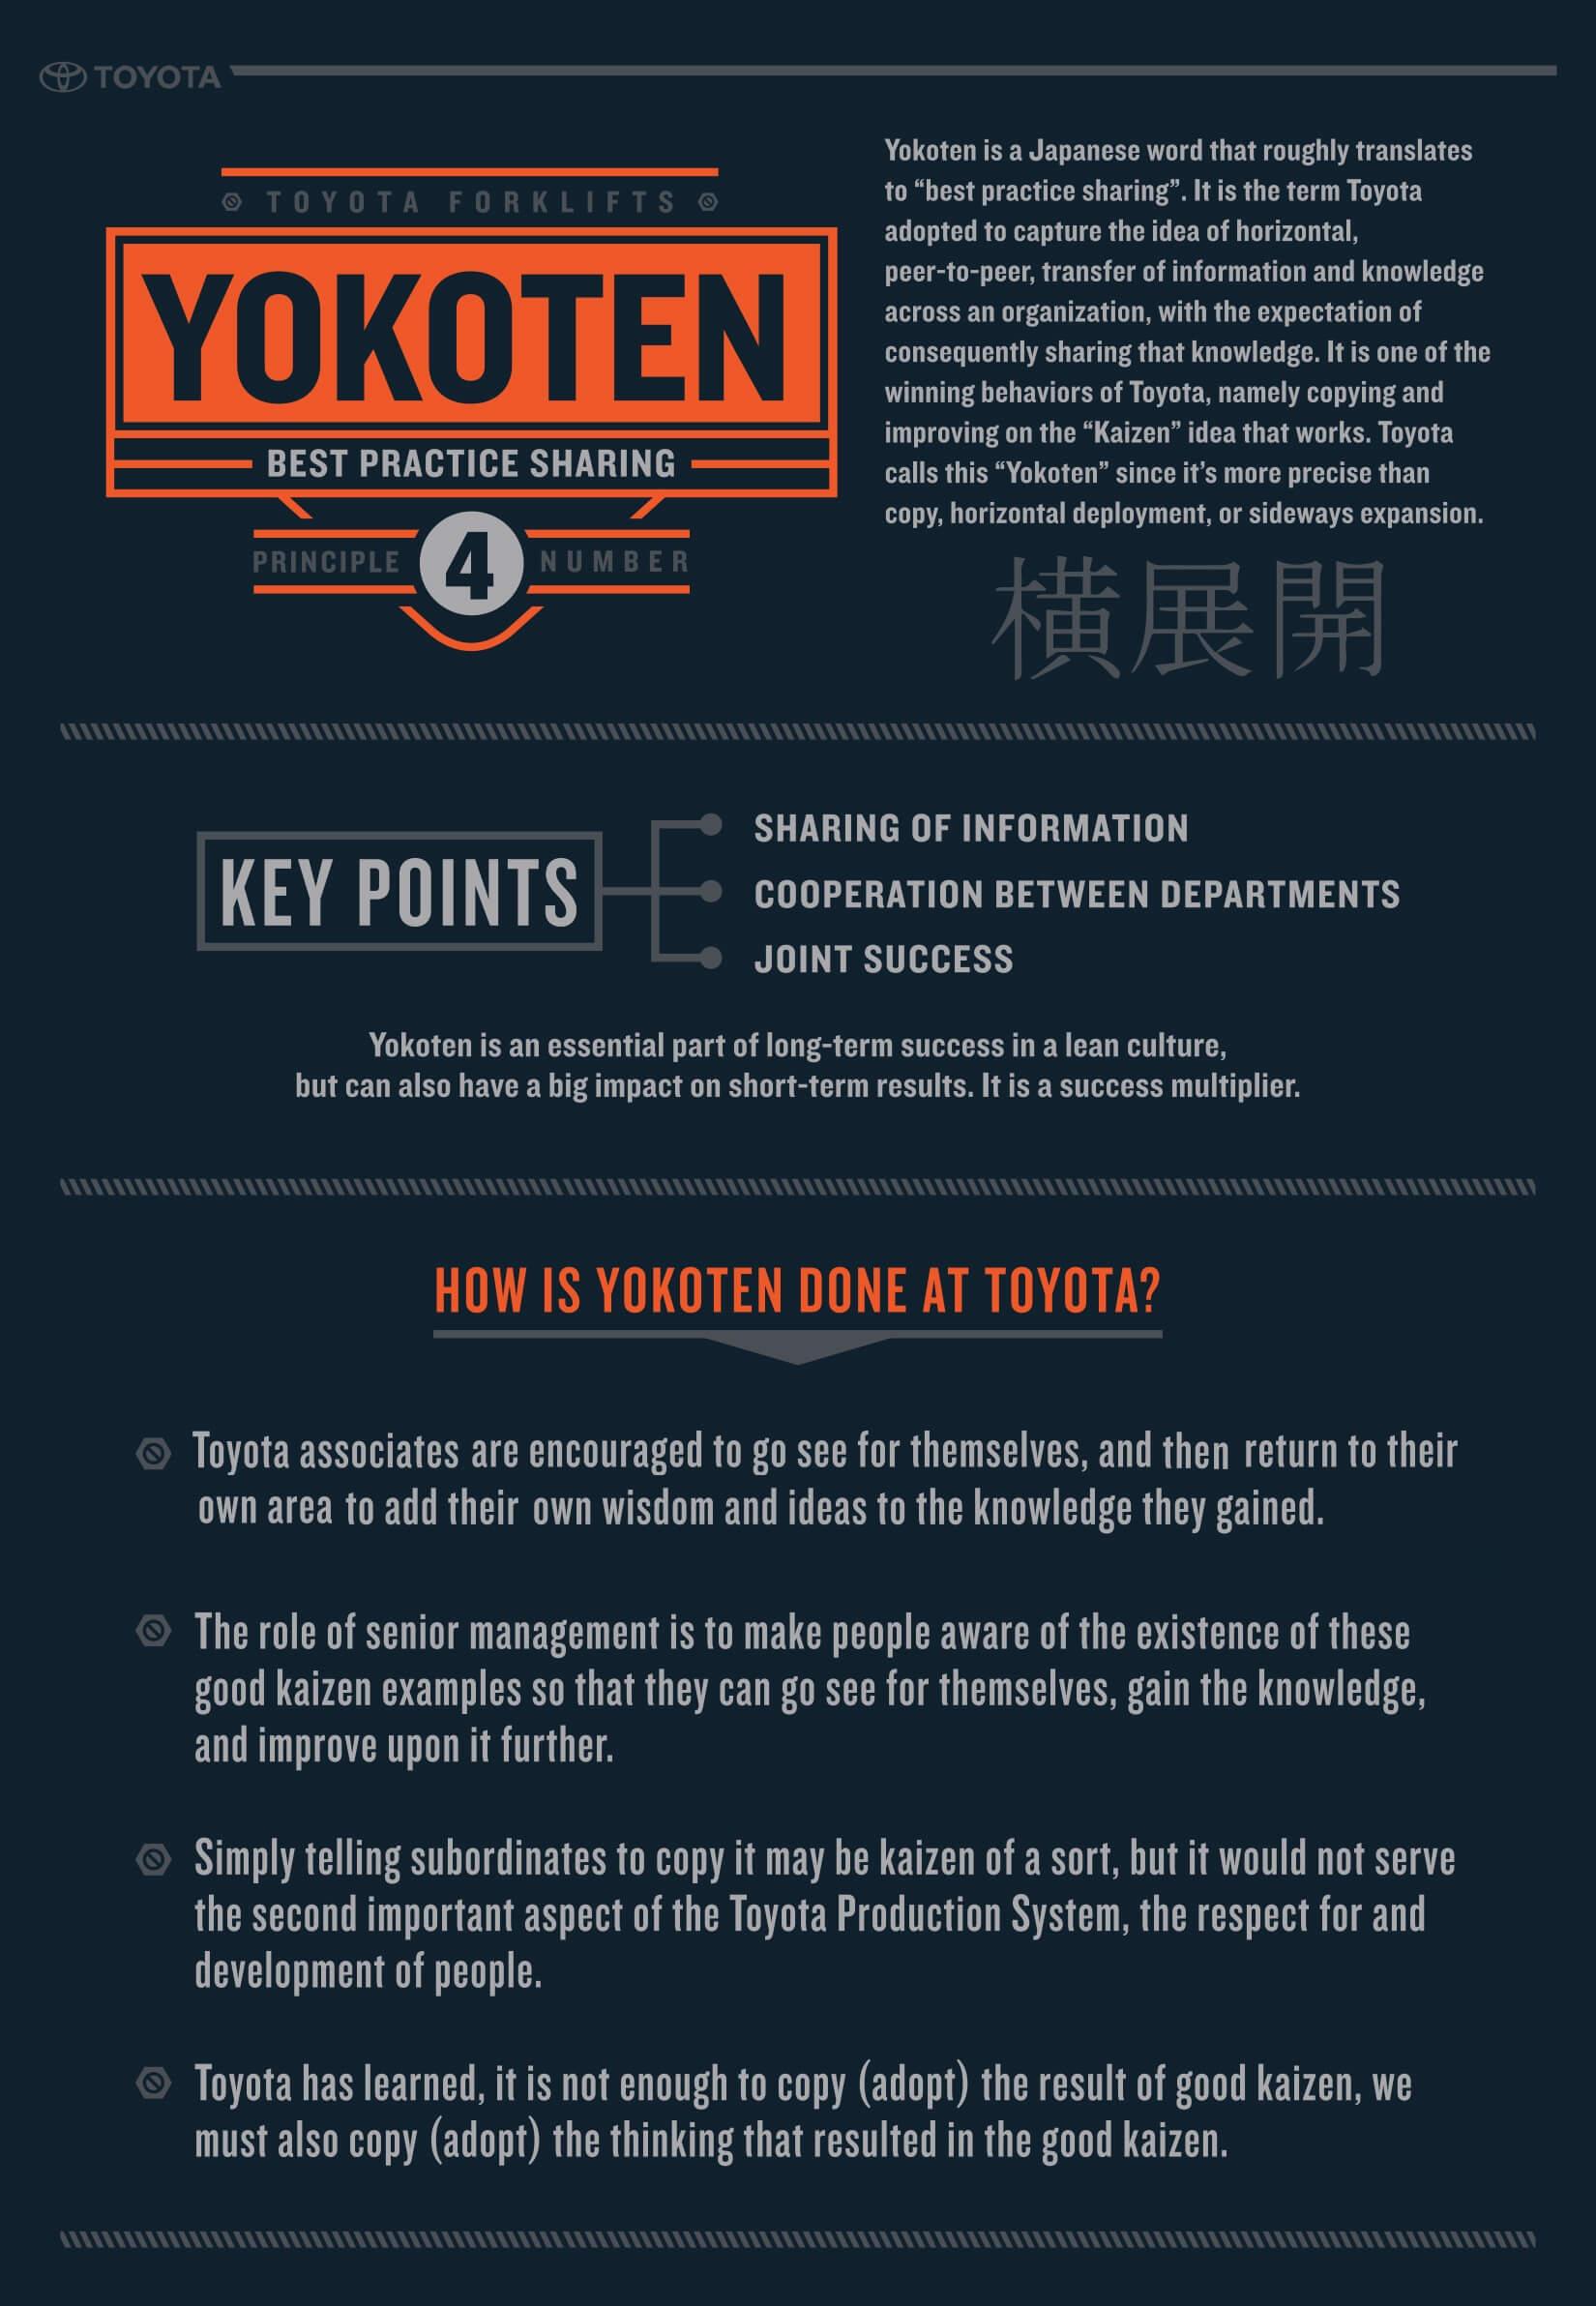 Yokoten Infographic Toyota Forklifts